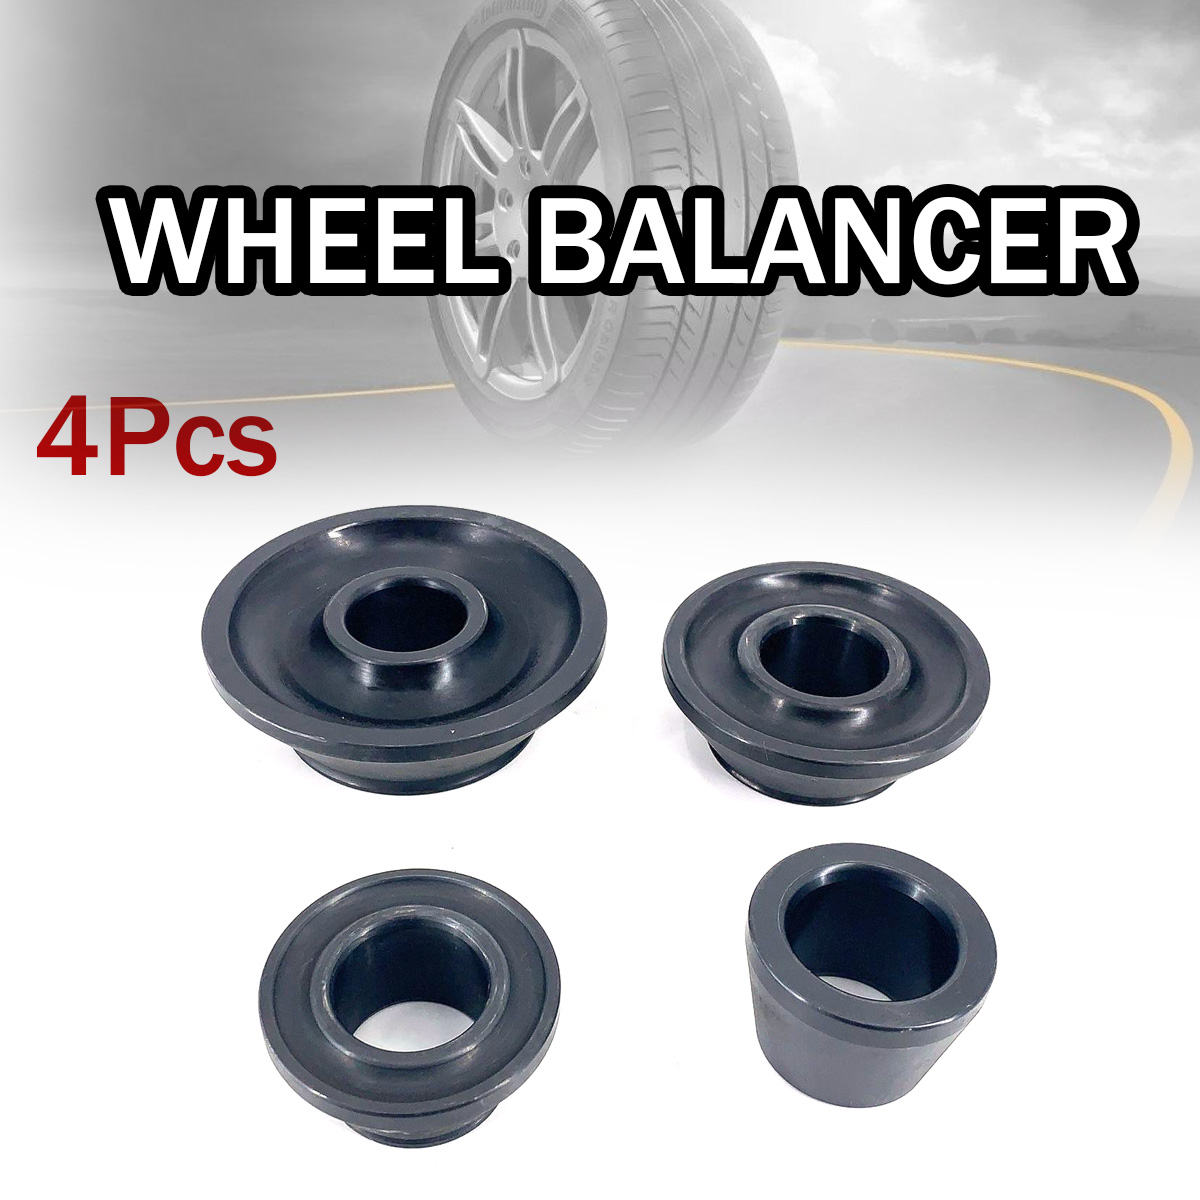 4pcs Wheel Balancer Standard Taper Cone Kit 40mm Shaft Accuturn Coats Taper Cone